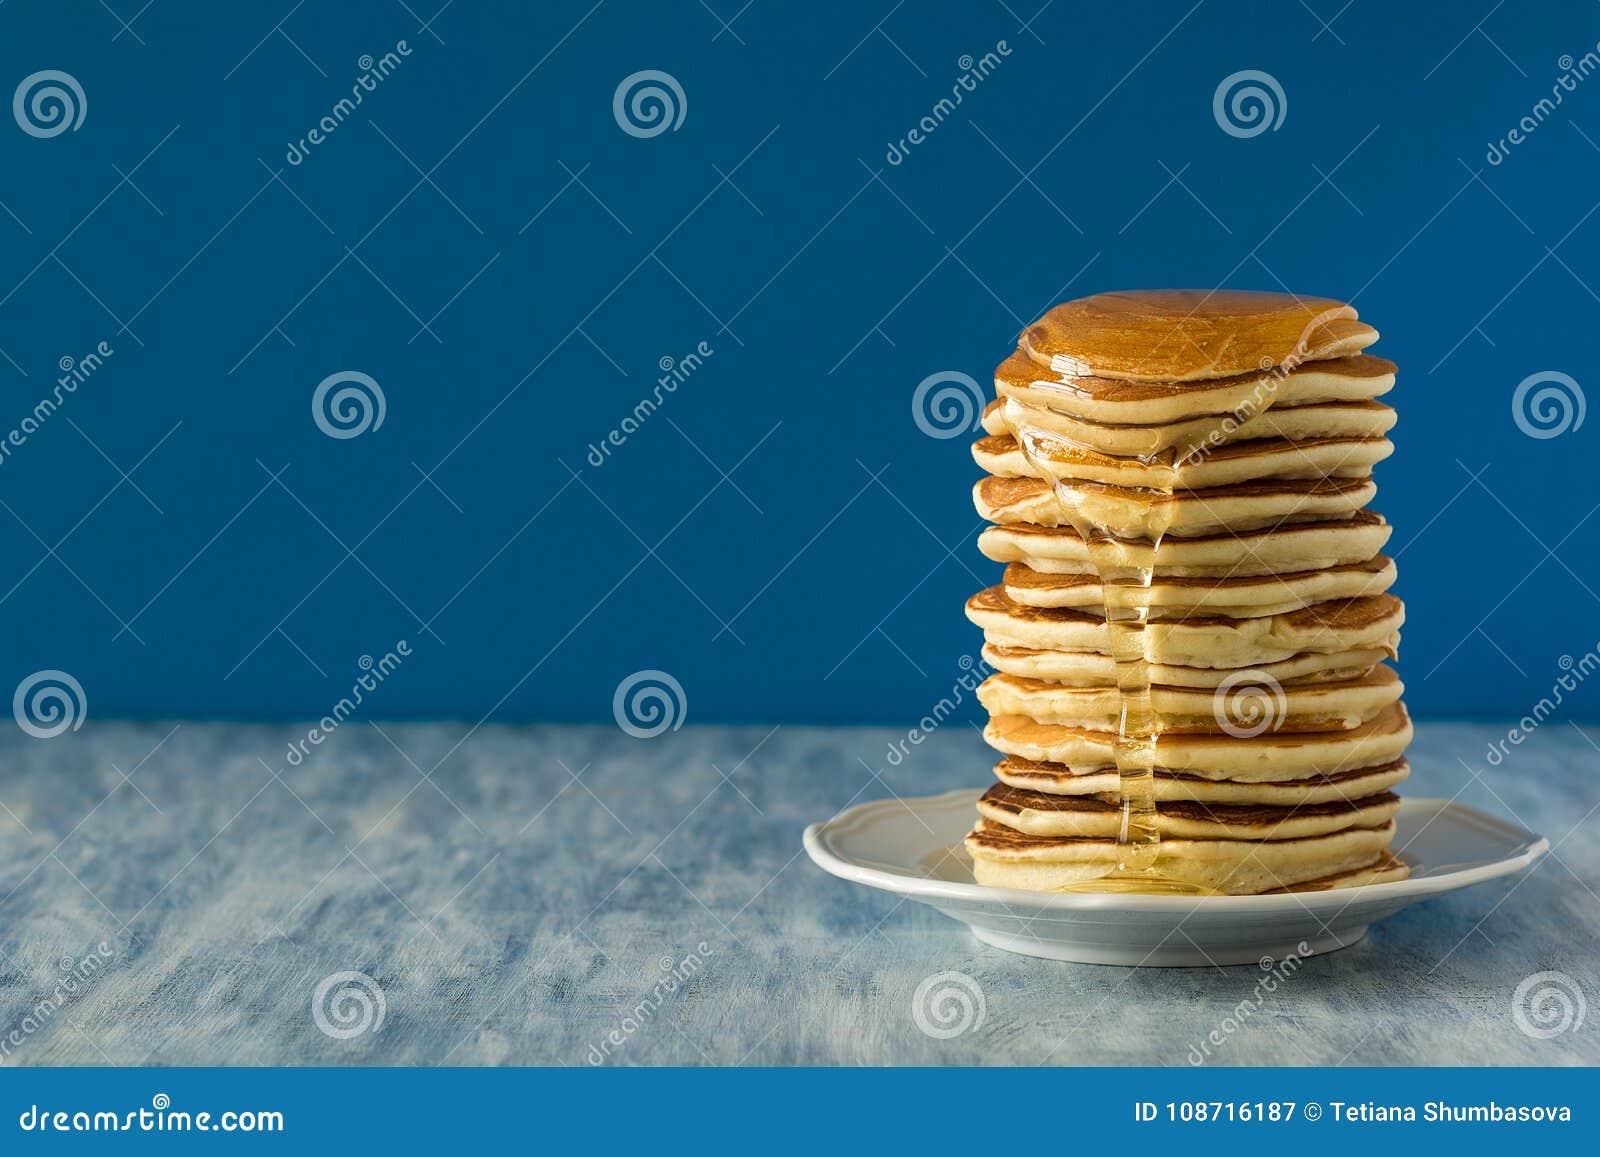 Bunt av pannkakor med honen